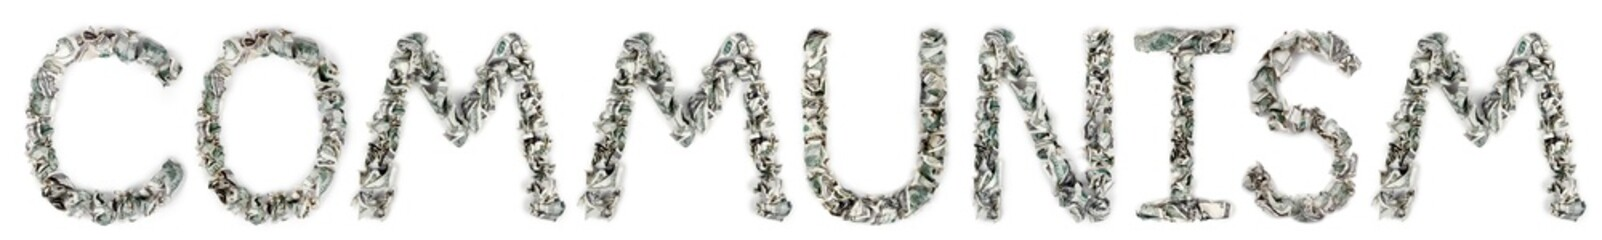 Communism - Crimped 100$ Bills